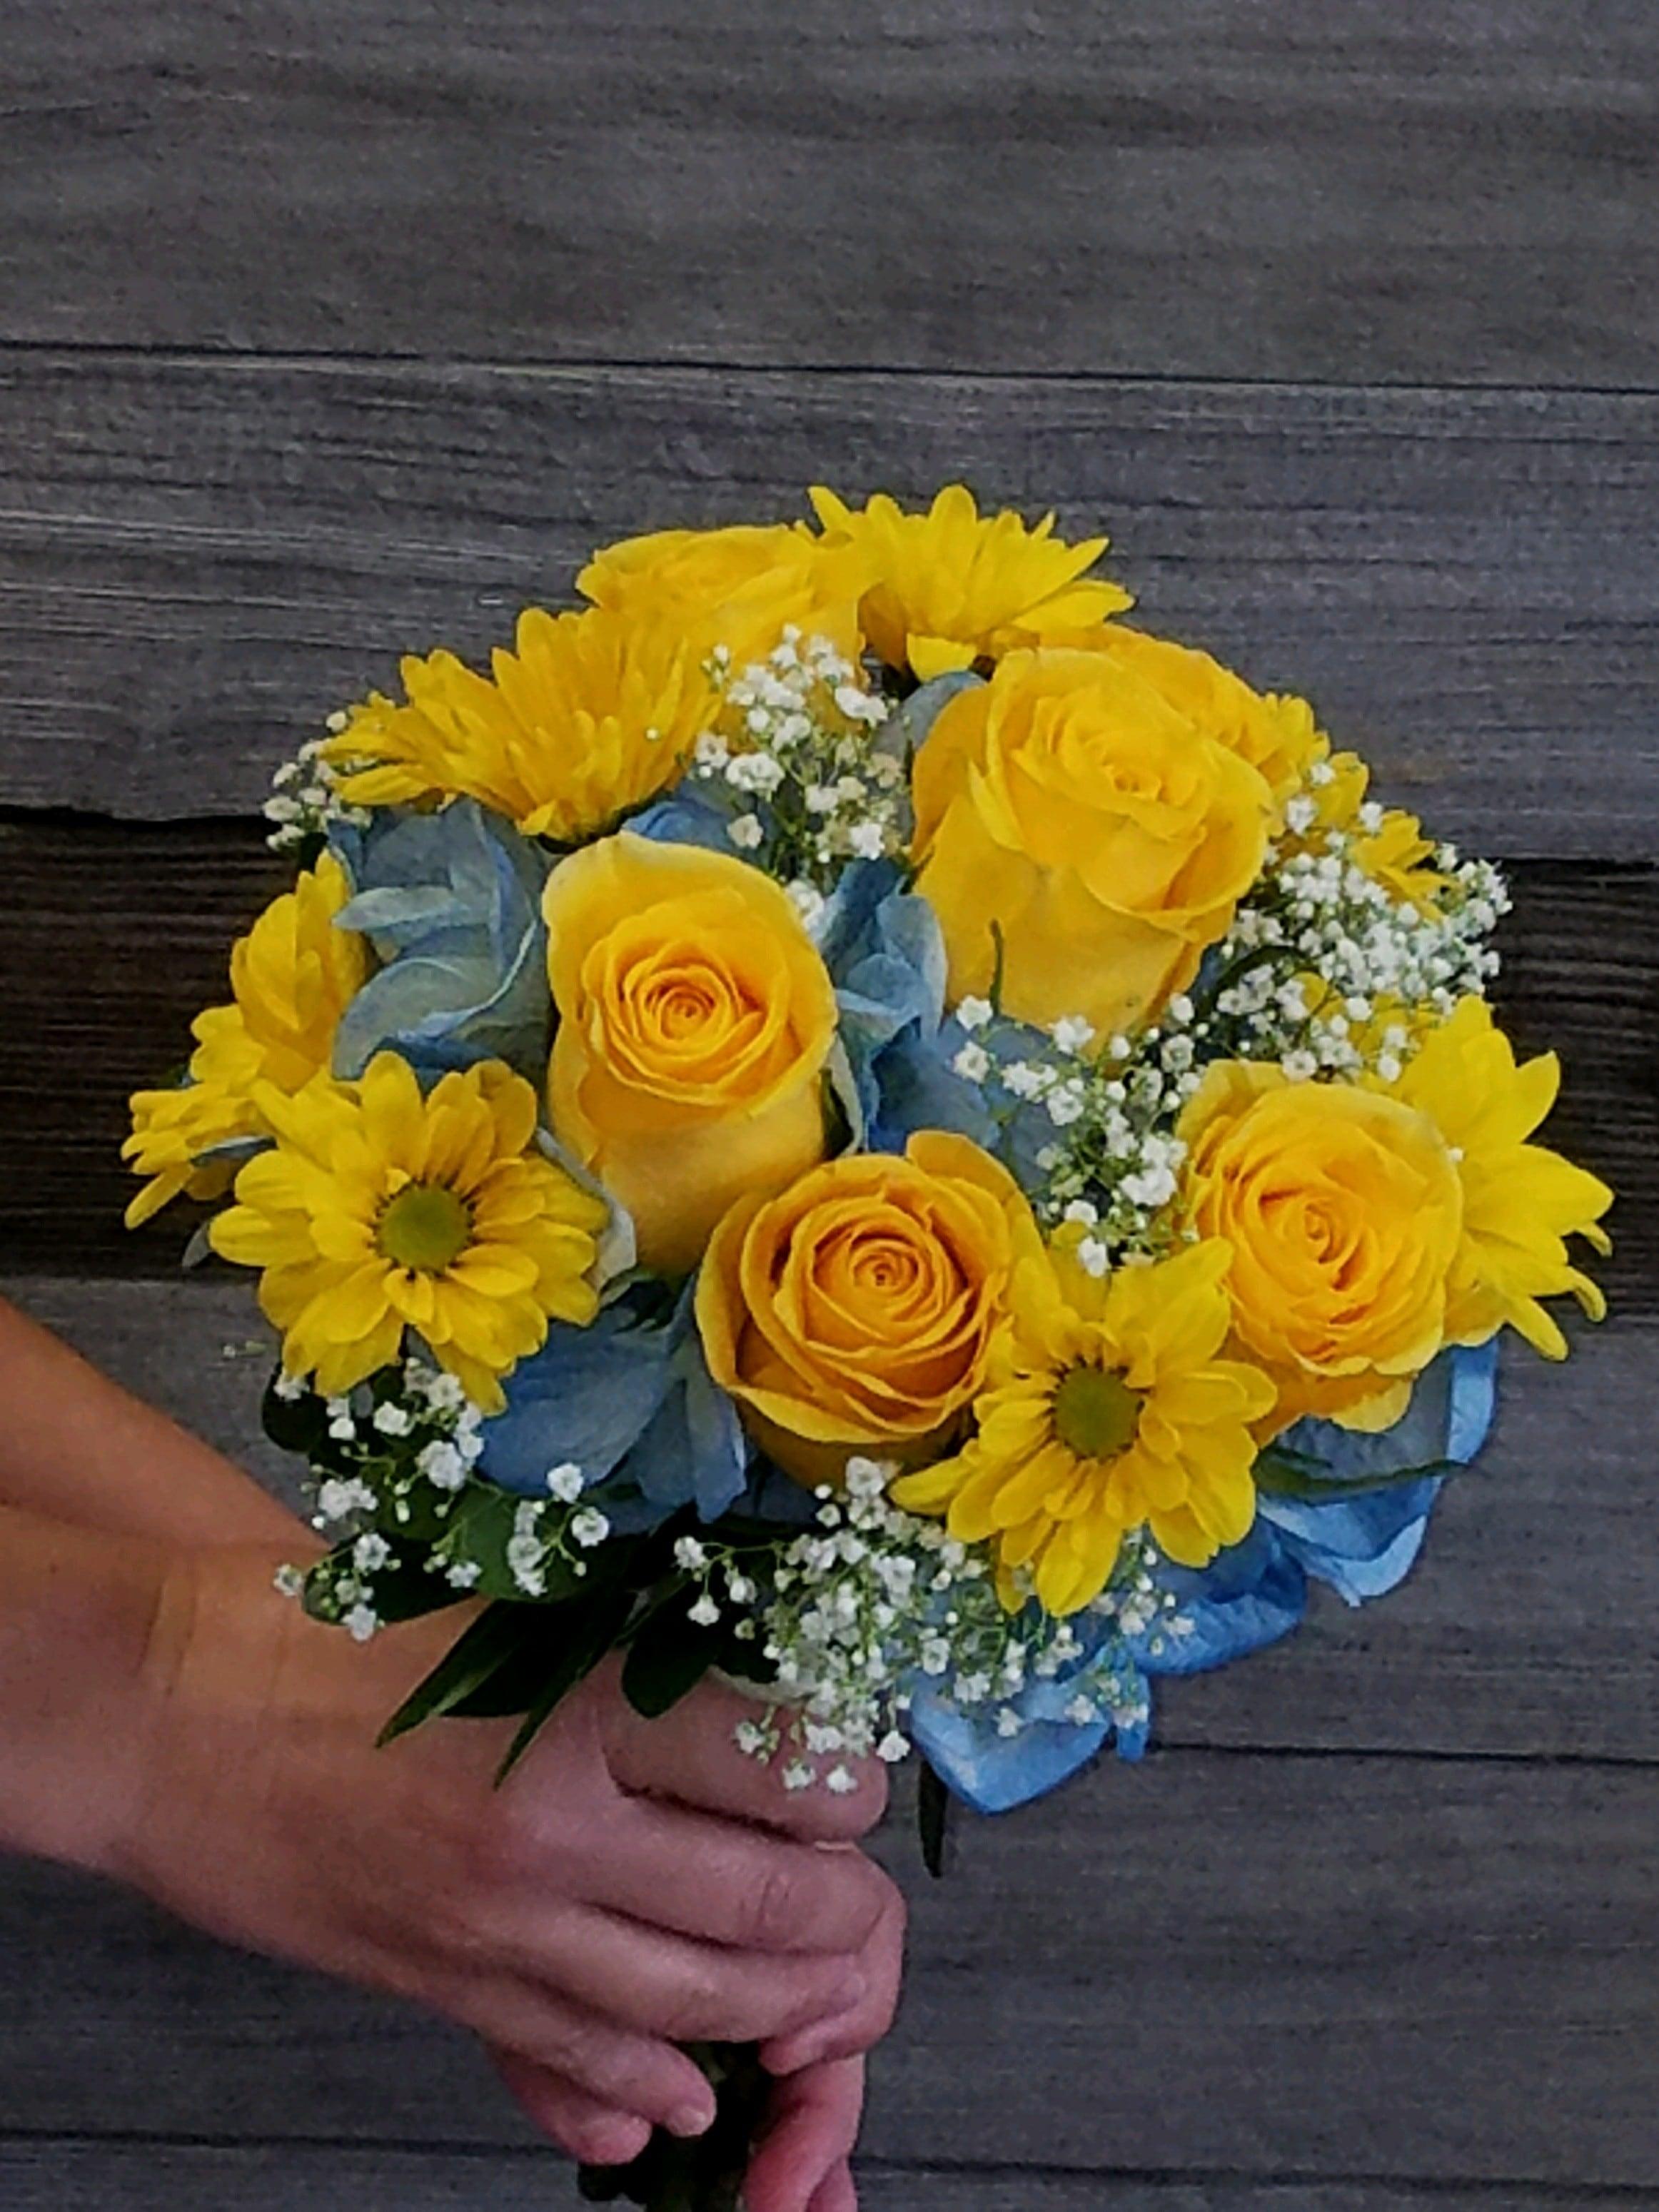 Wedding Flower Gallery Gaffaneys Floral In Dickinson